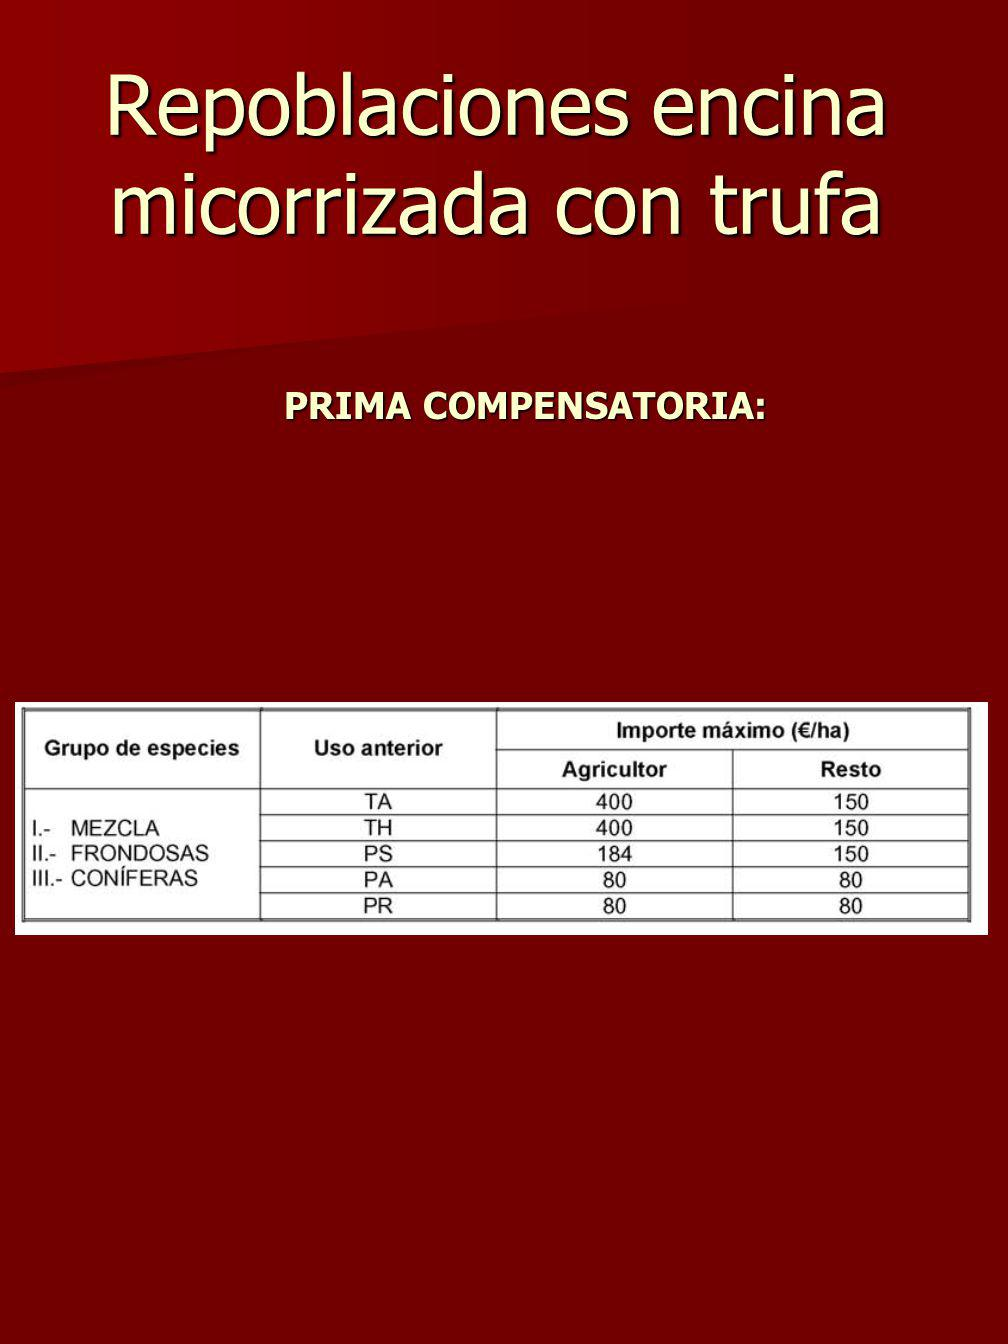 Repoblaciones encina micorrizada con trufa PRIMA COMPENSATORIA: